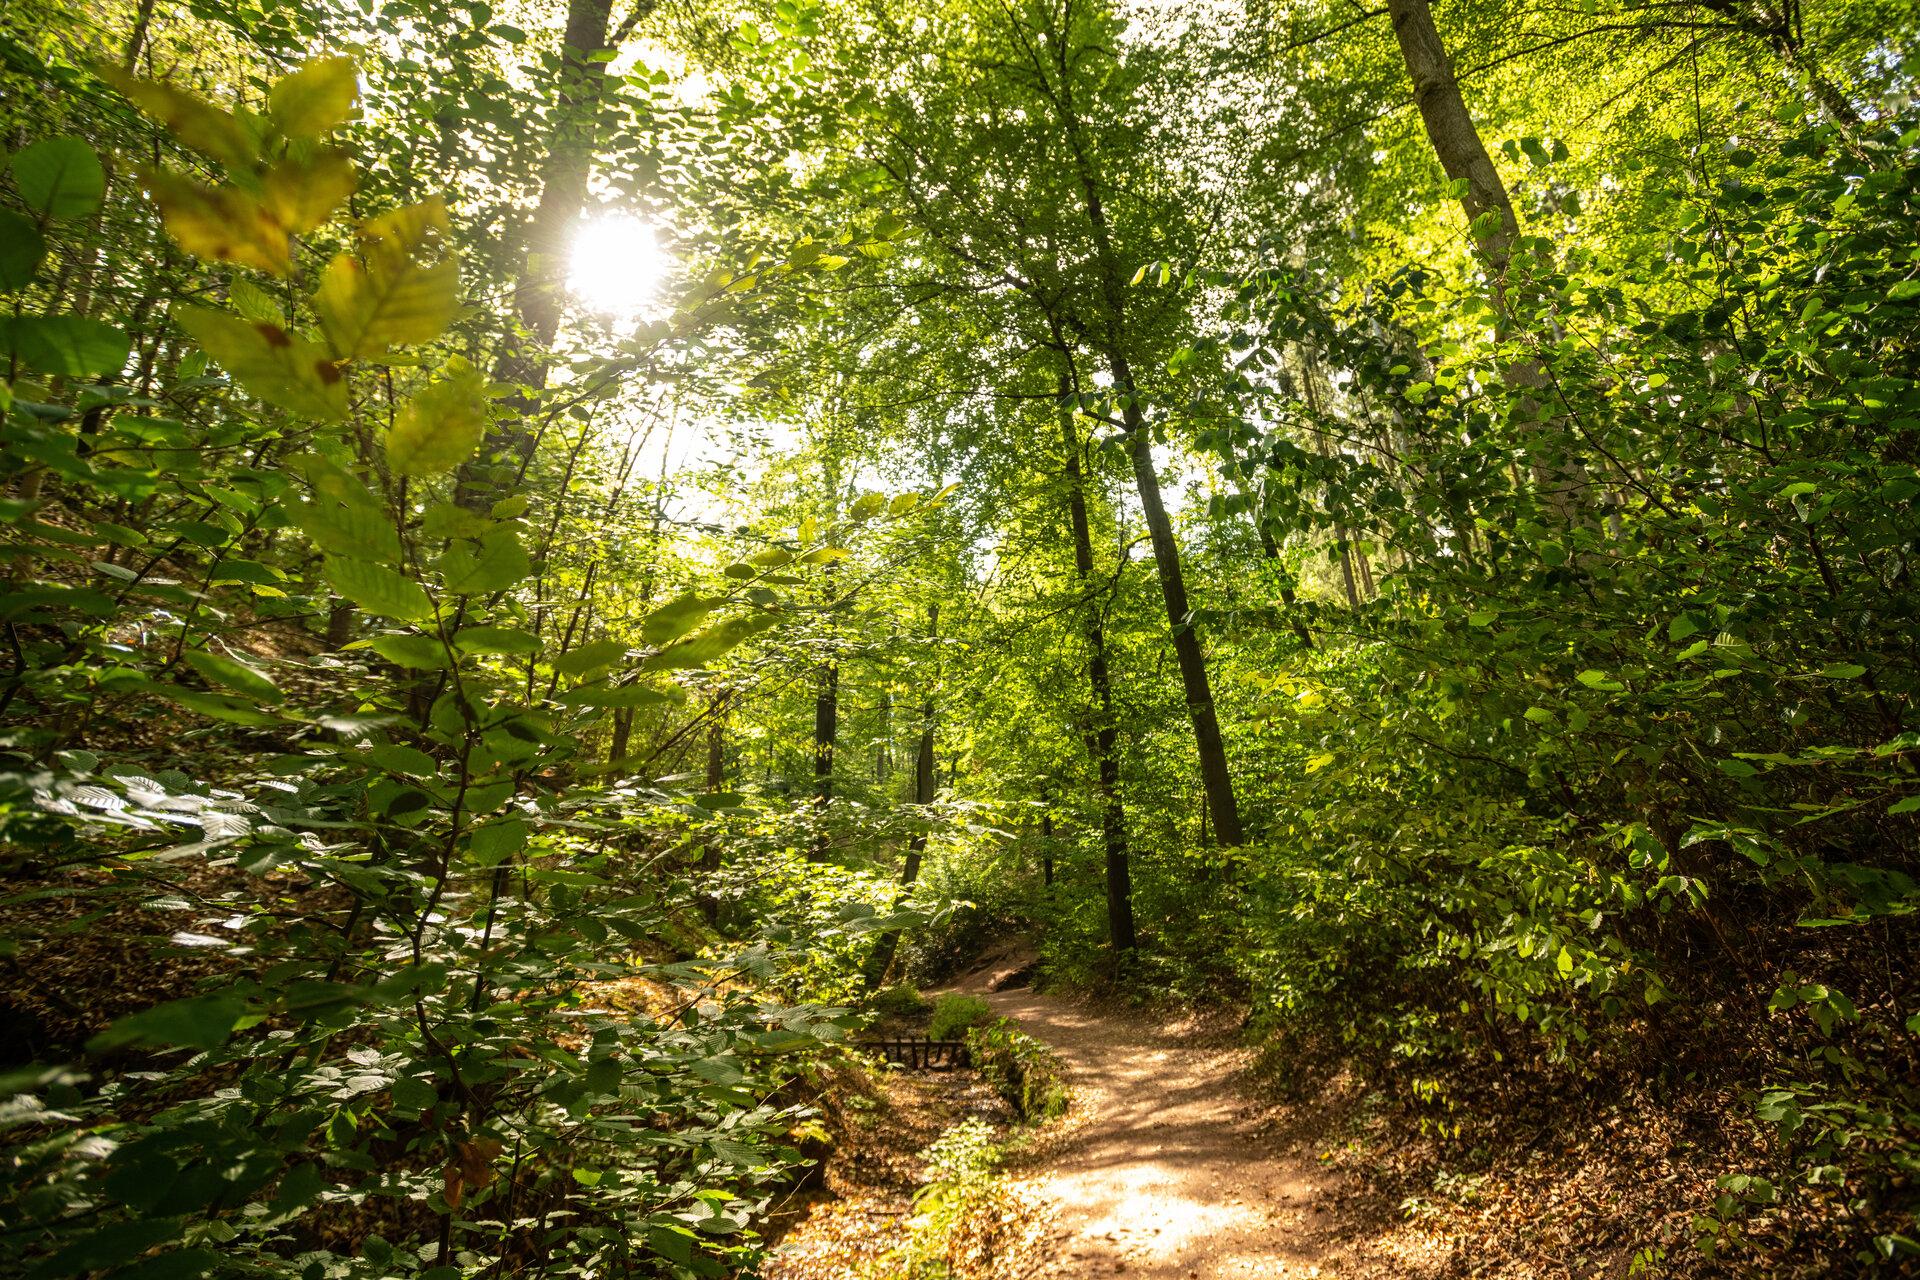 Thüringer Wald bei Eisenach (Dominik Ketz)